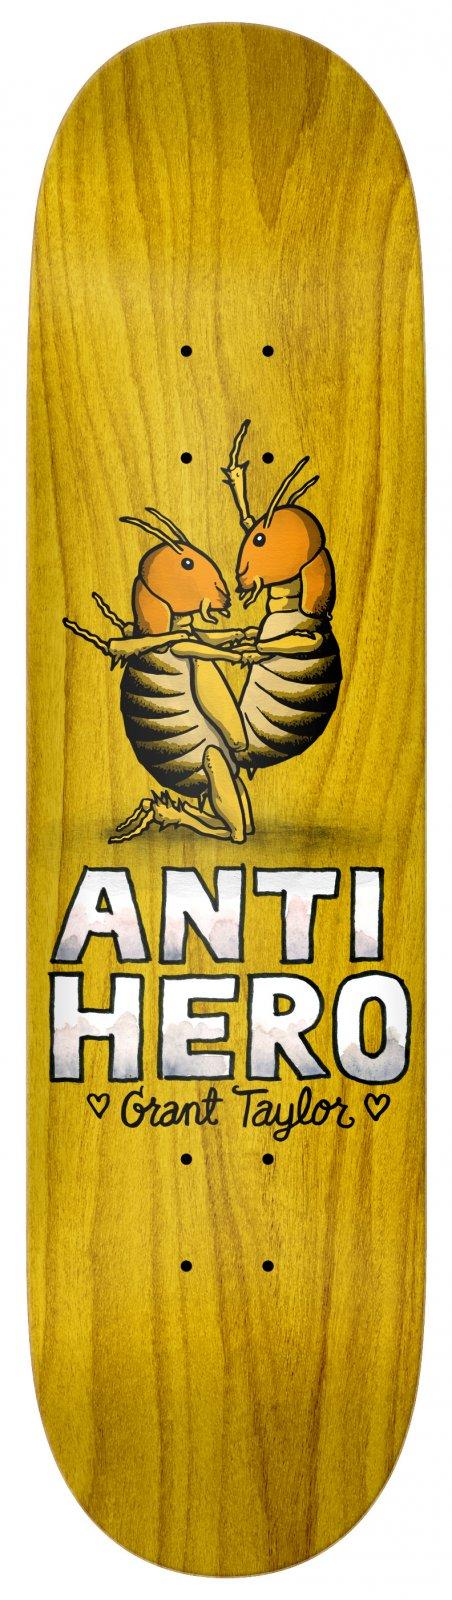 Anti Hero Grant Taylor For Lovers II 8.12 x 31.38 Skateboard Deck